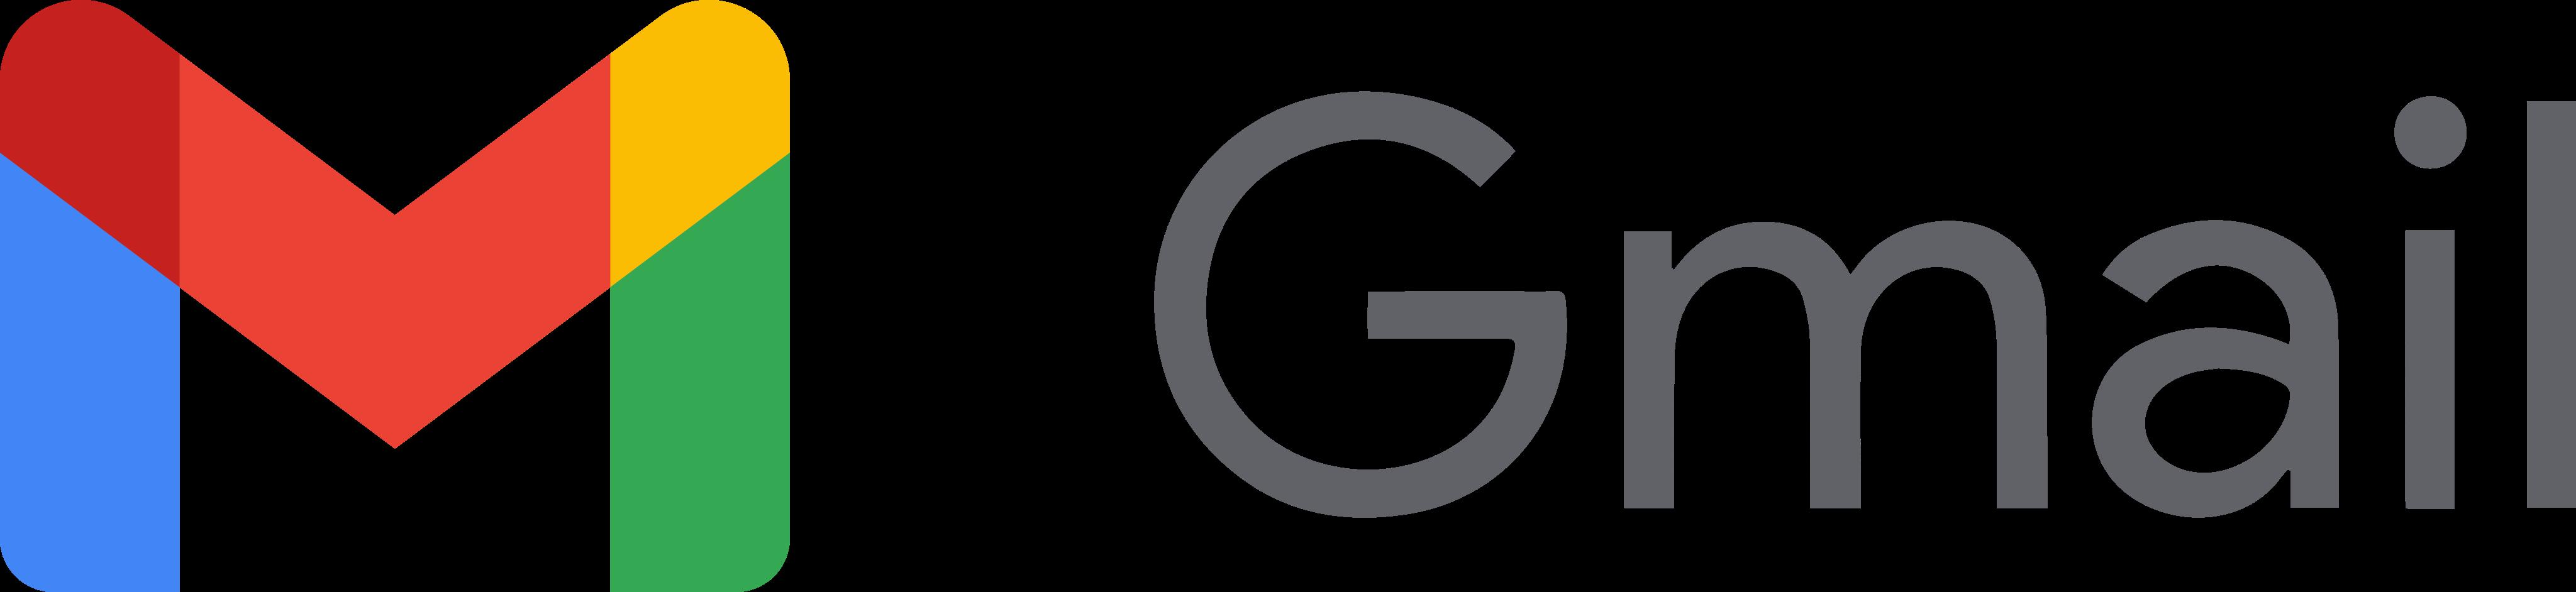 gmail logo 1 1 - Gmail Logo